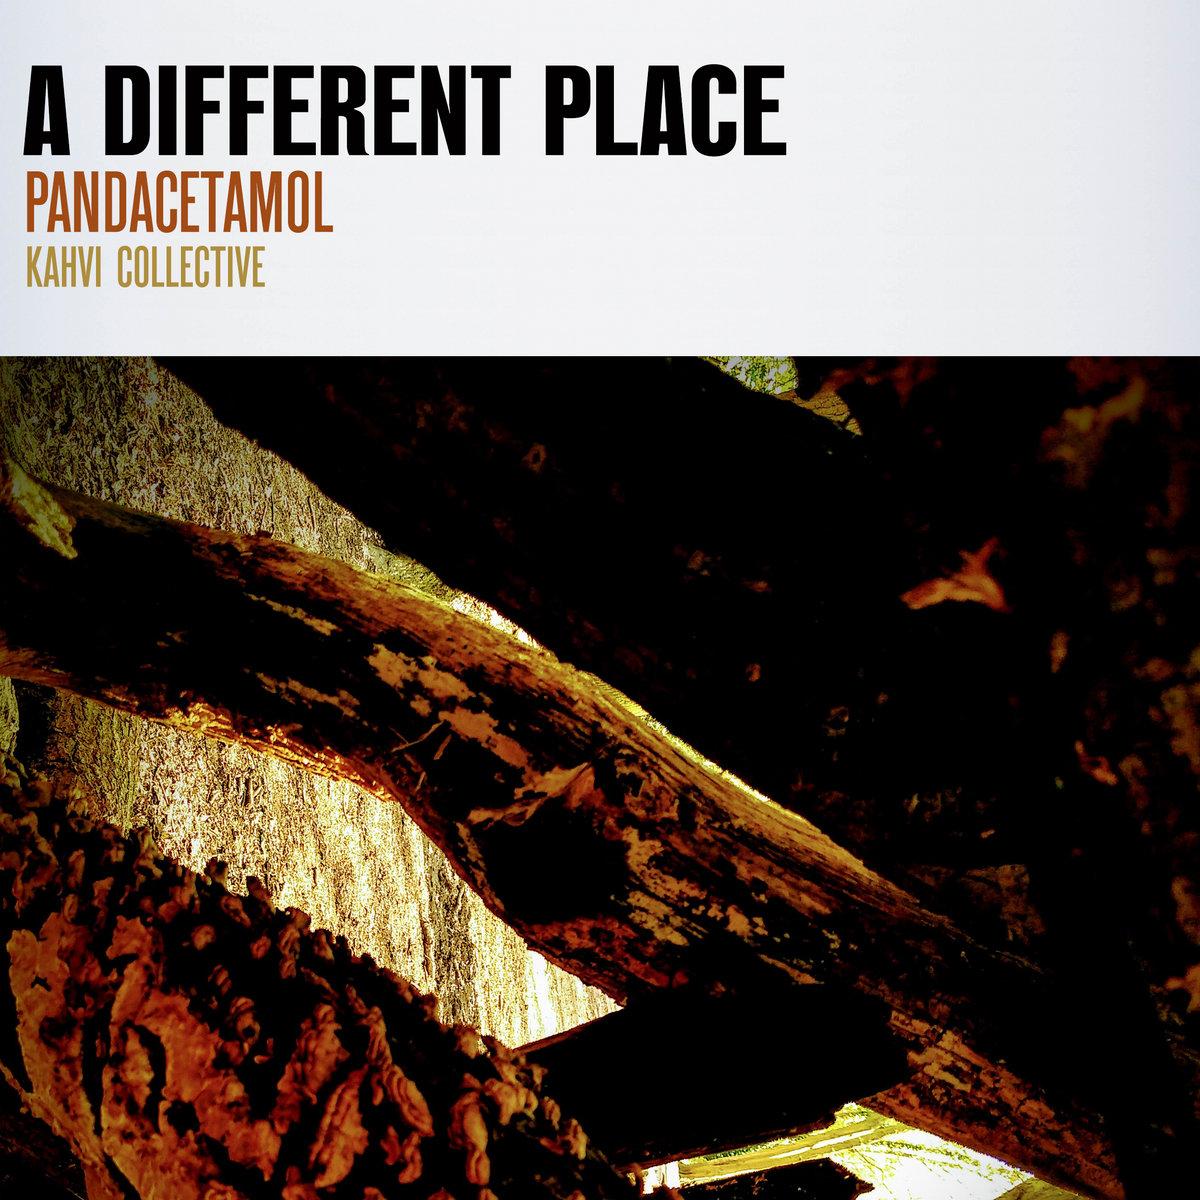 Pandacetamol – A Different Place